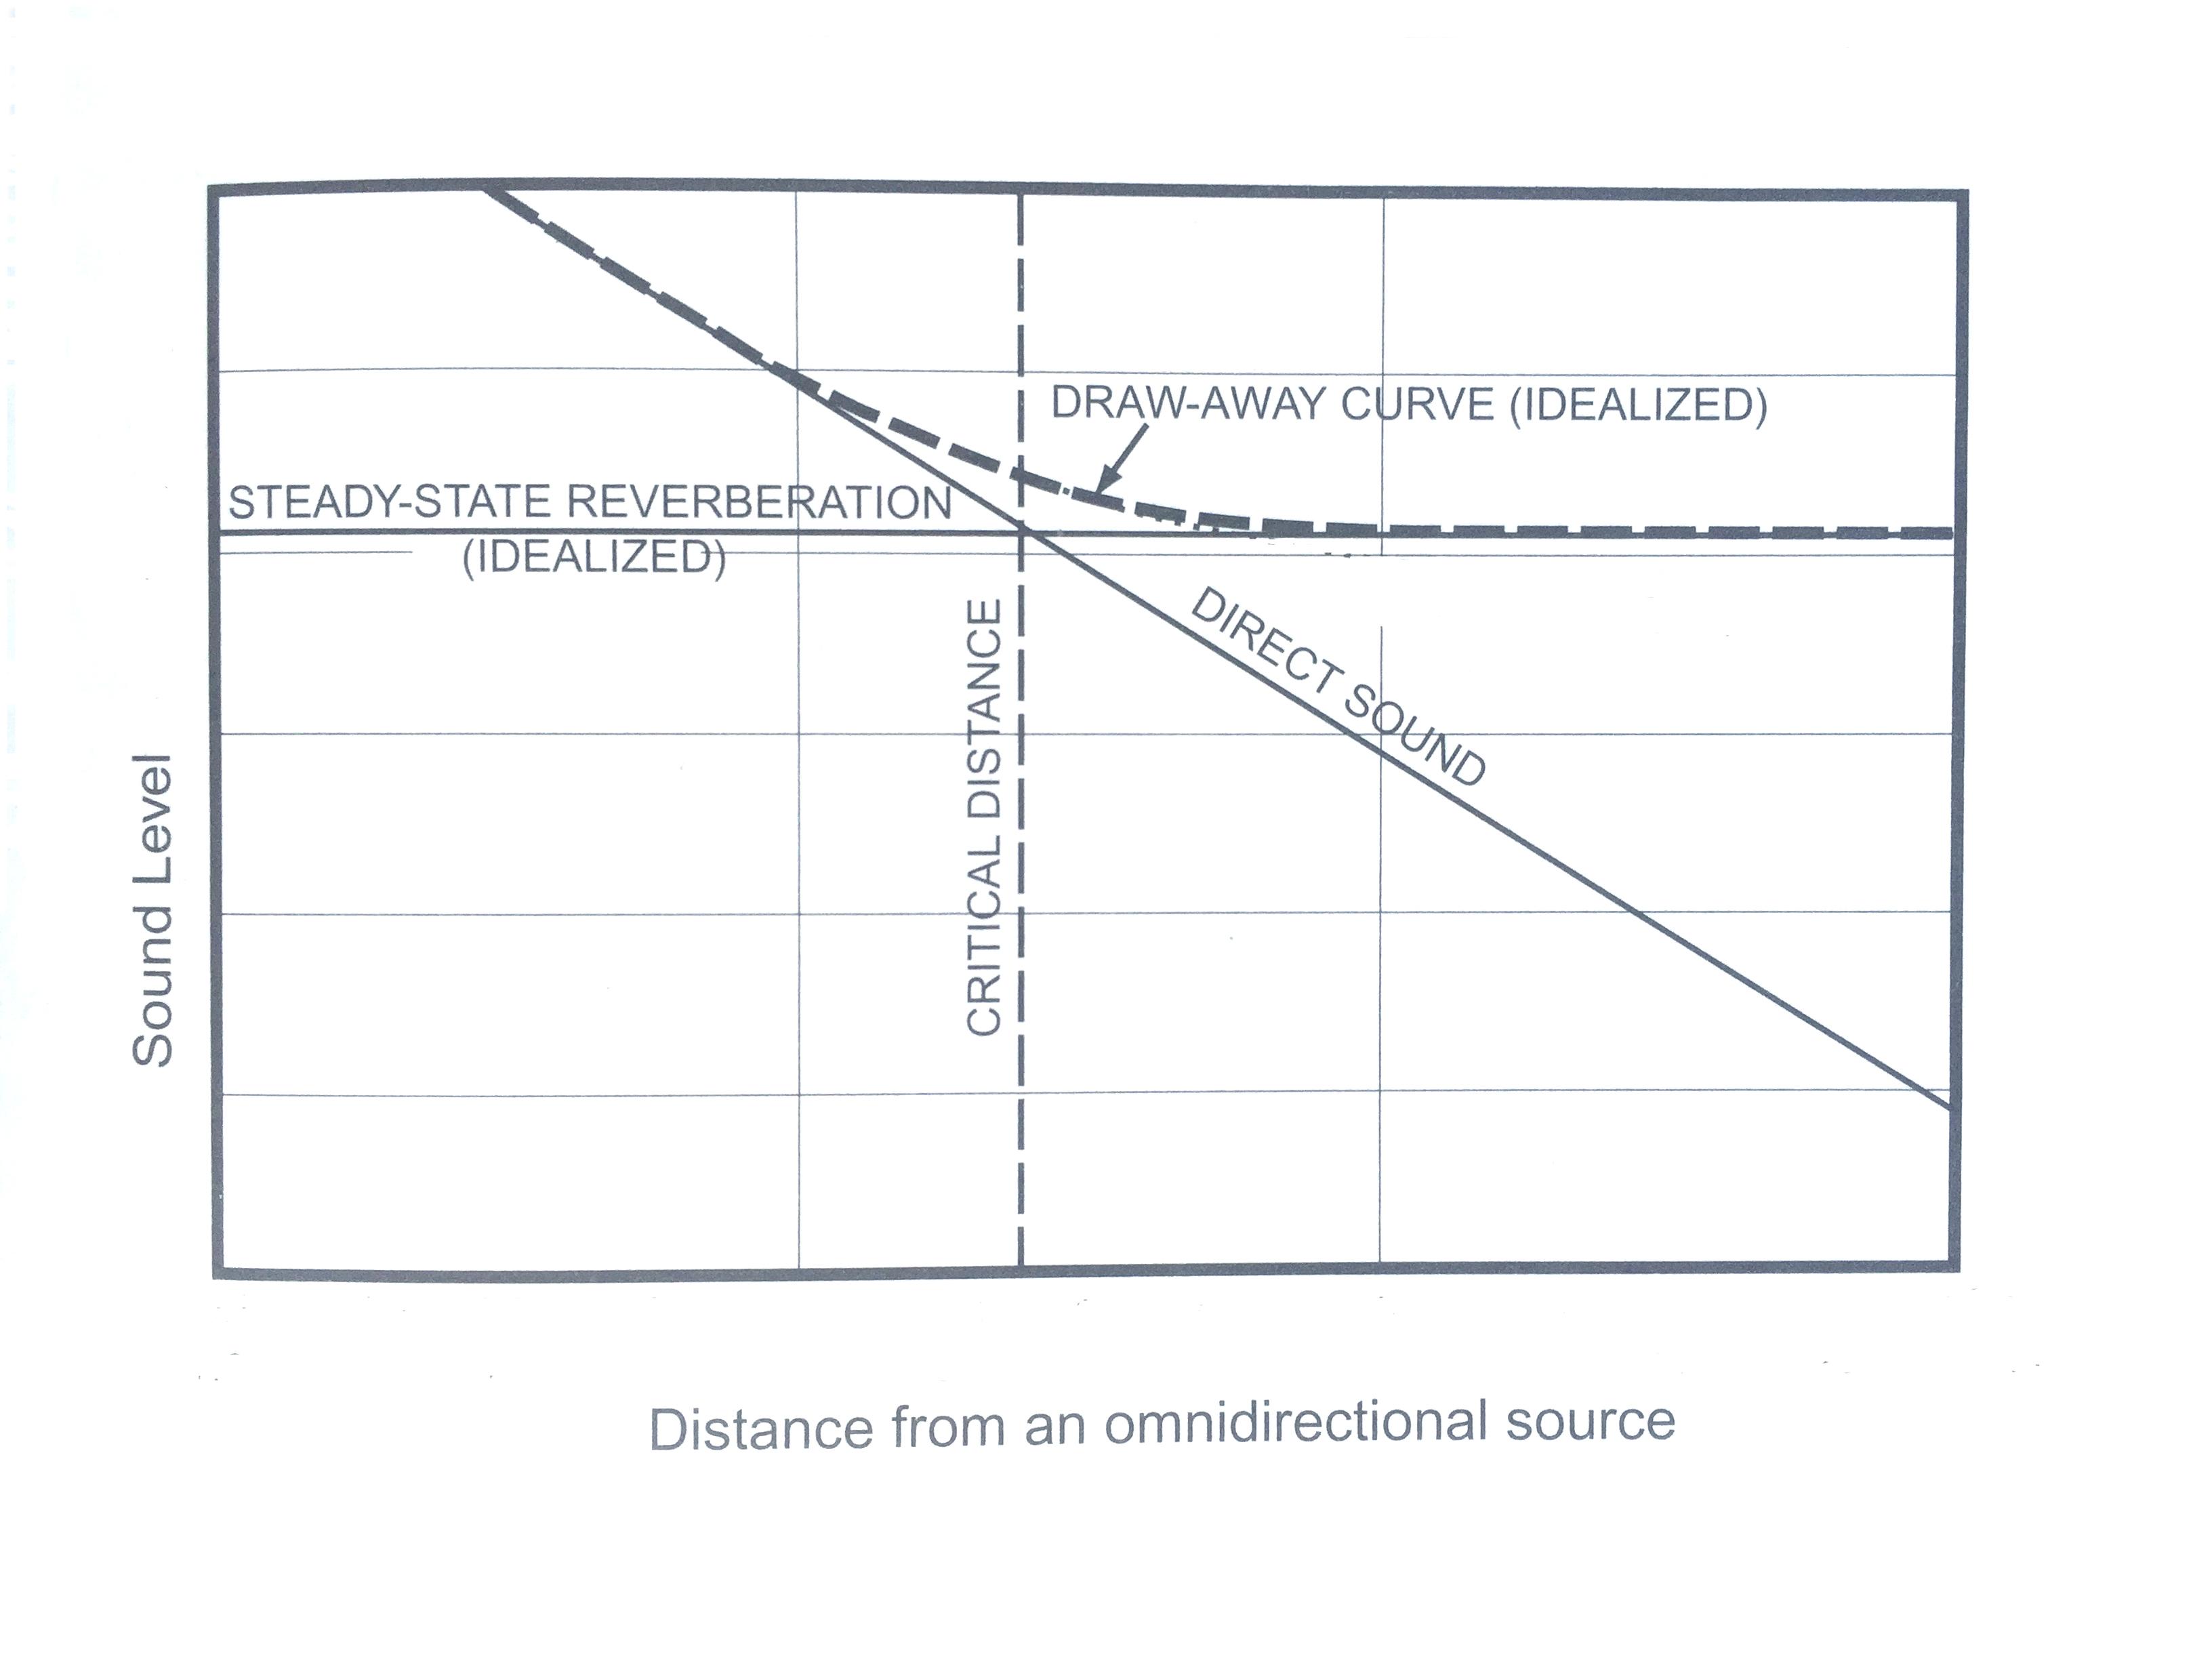 sound pressure level and distribution